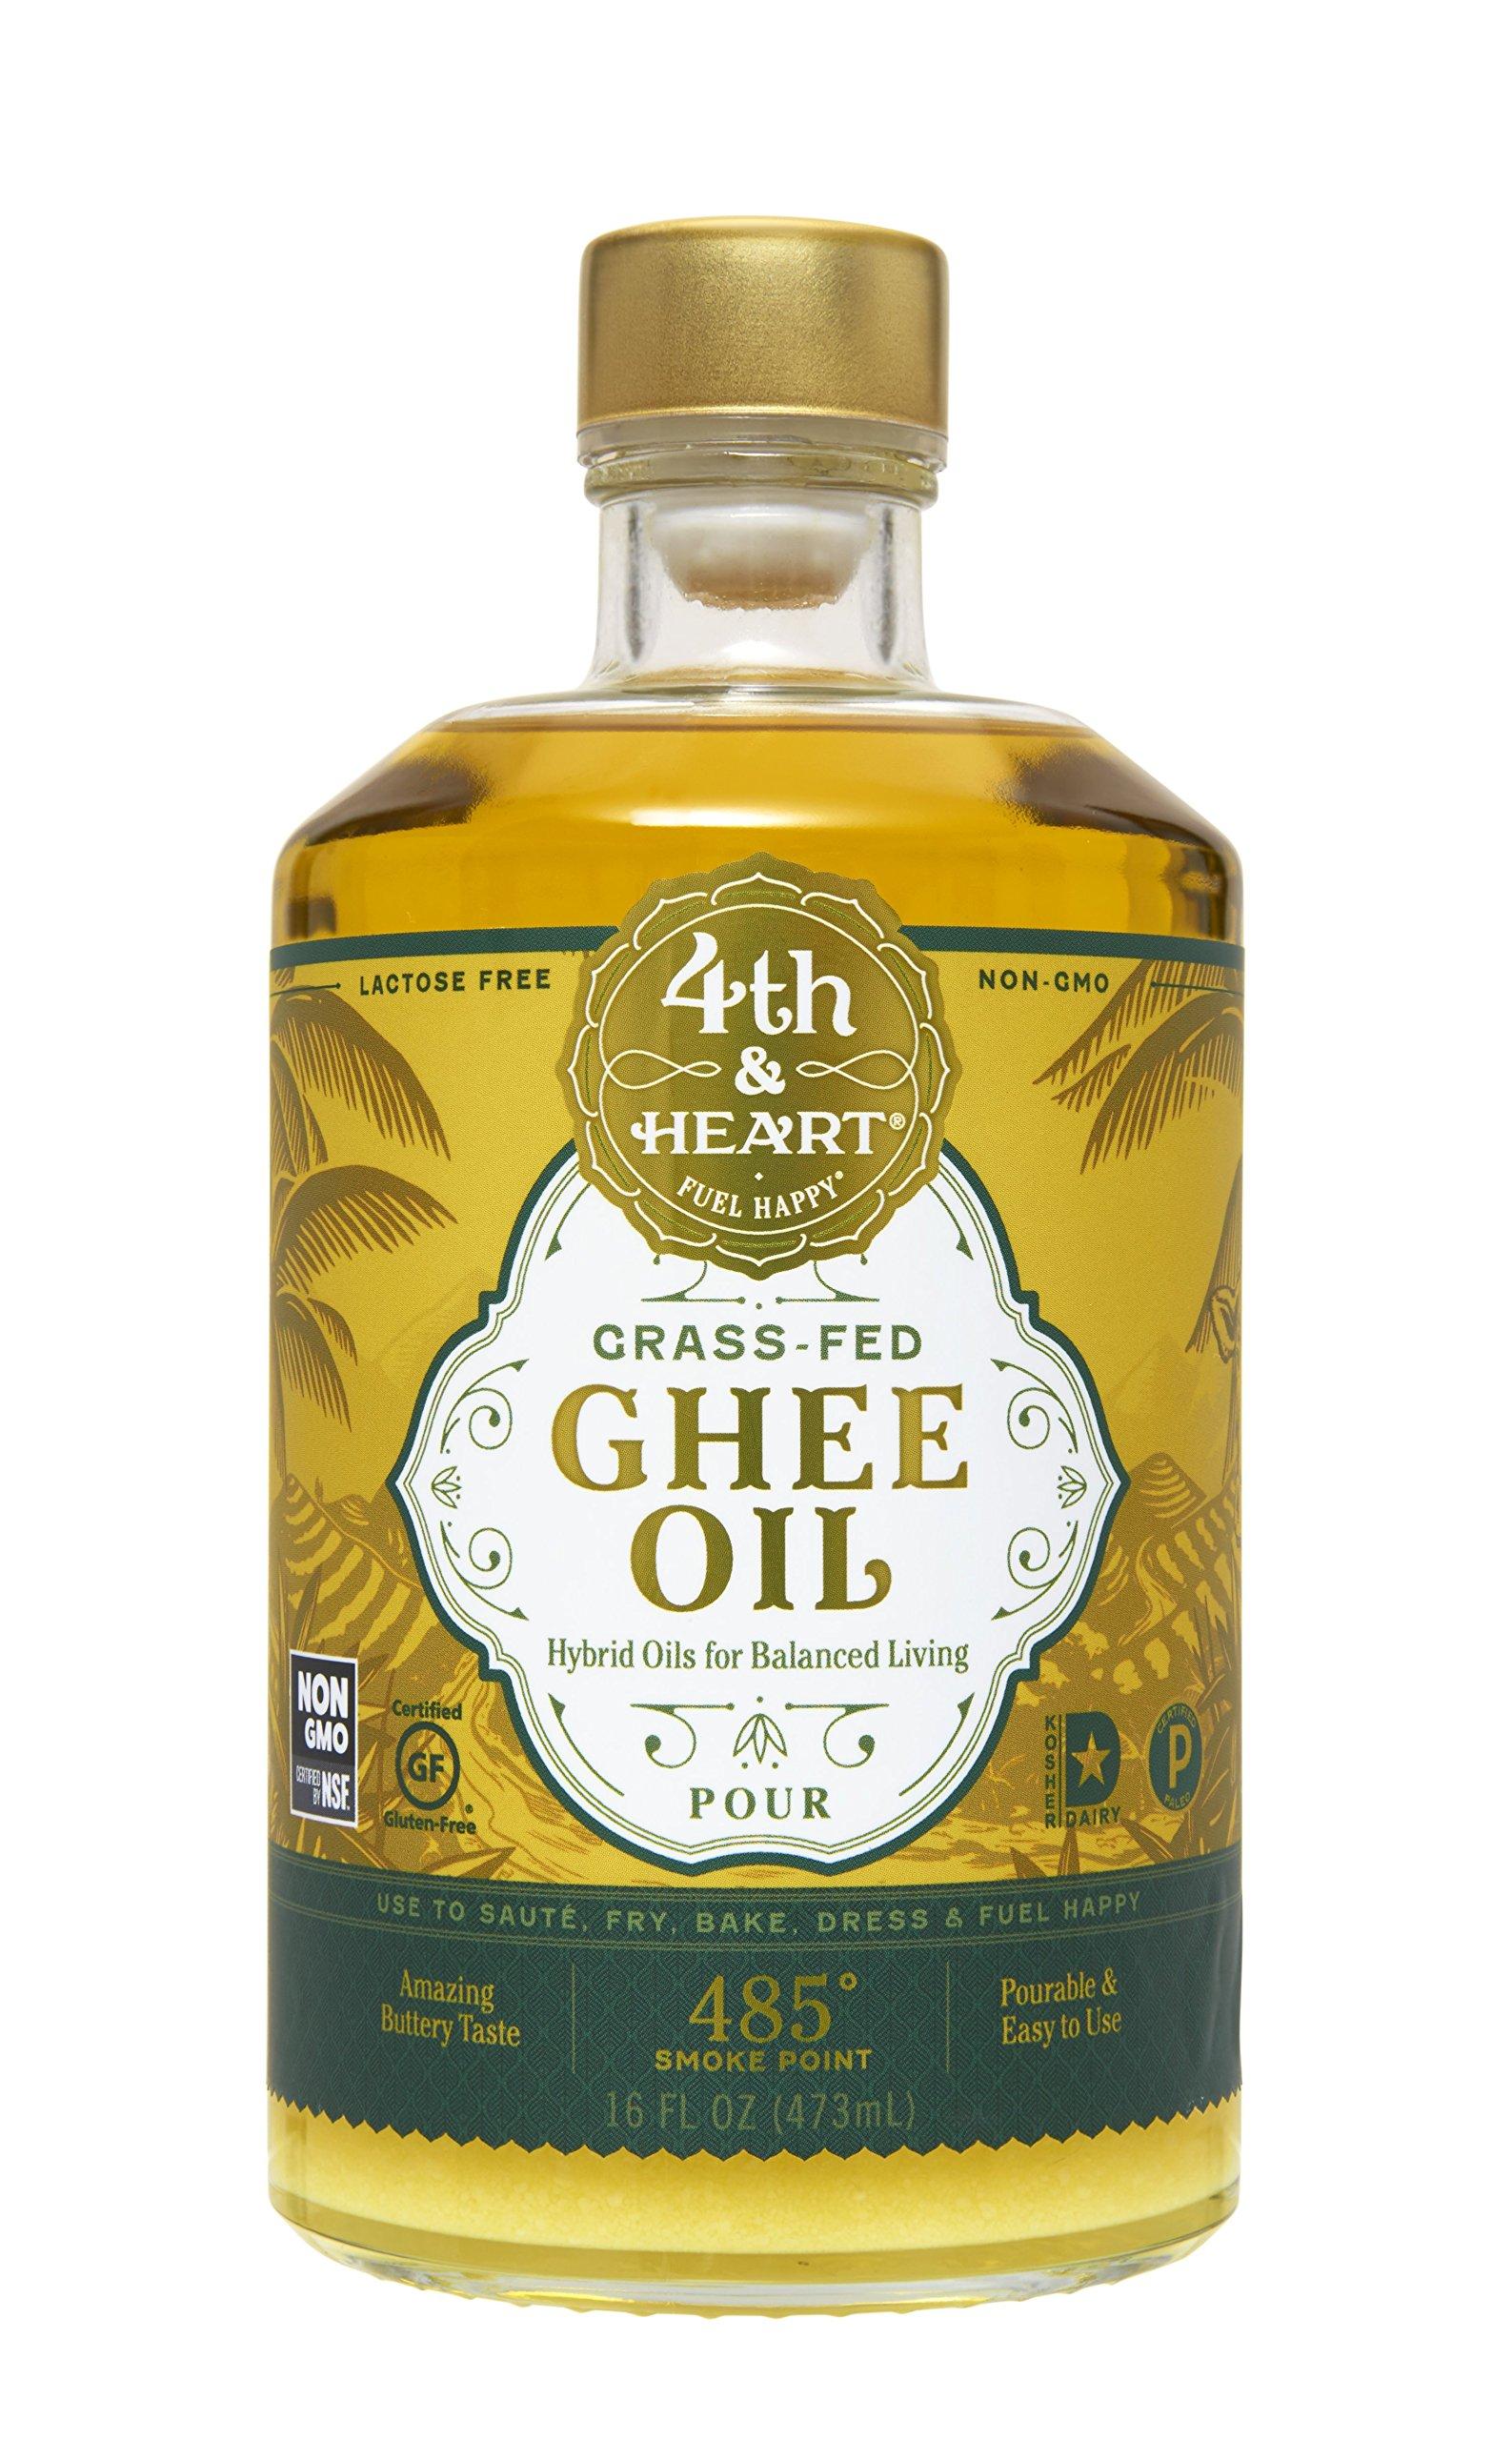 Grass-Fed Ghee Oil by 4th & Heart, 16oz, Non-GMO Verified Hybrid Oil, Balanced Omega Fatty Acids, Paleo Approved, Keto-Friendly